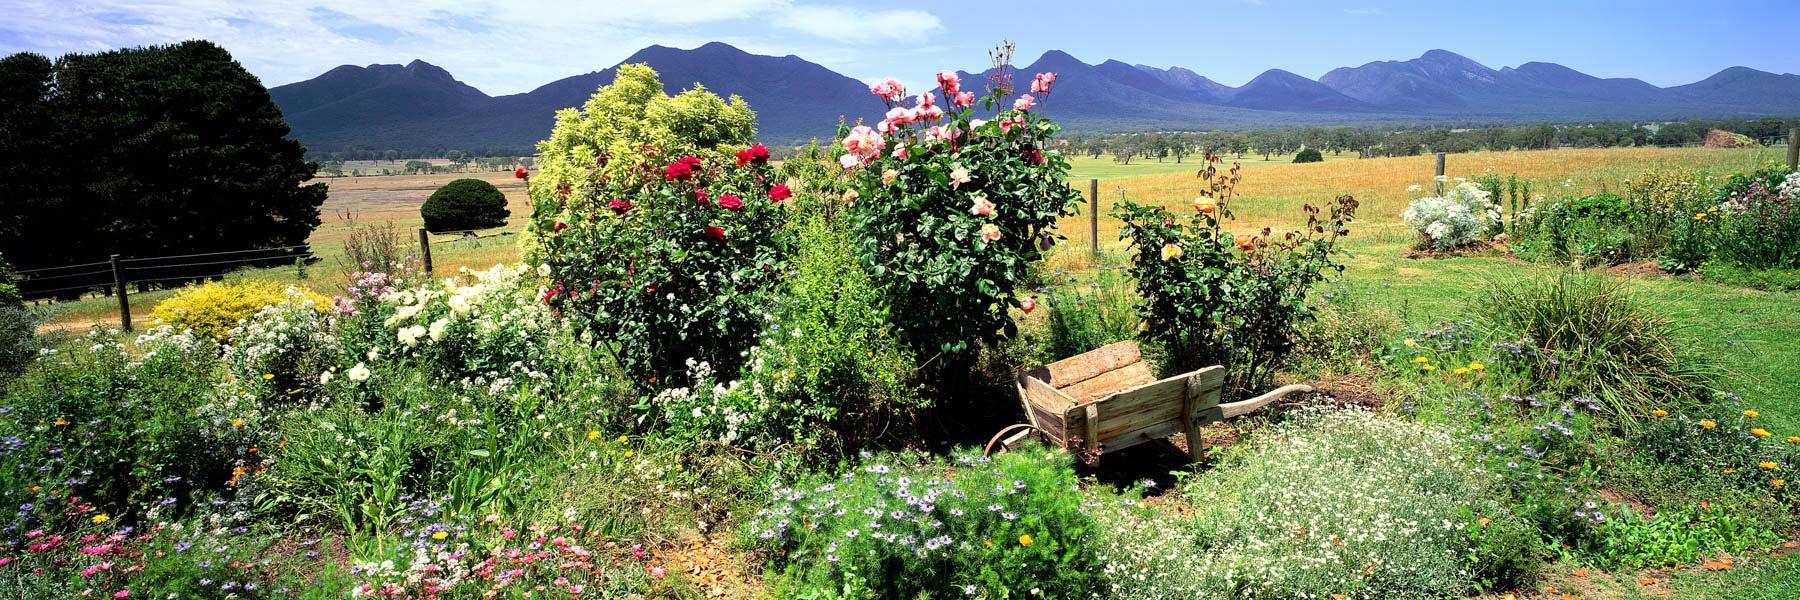 A delightful country garden, Mirranatwa Vallery, Victoria, Australia.